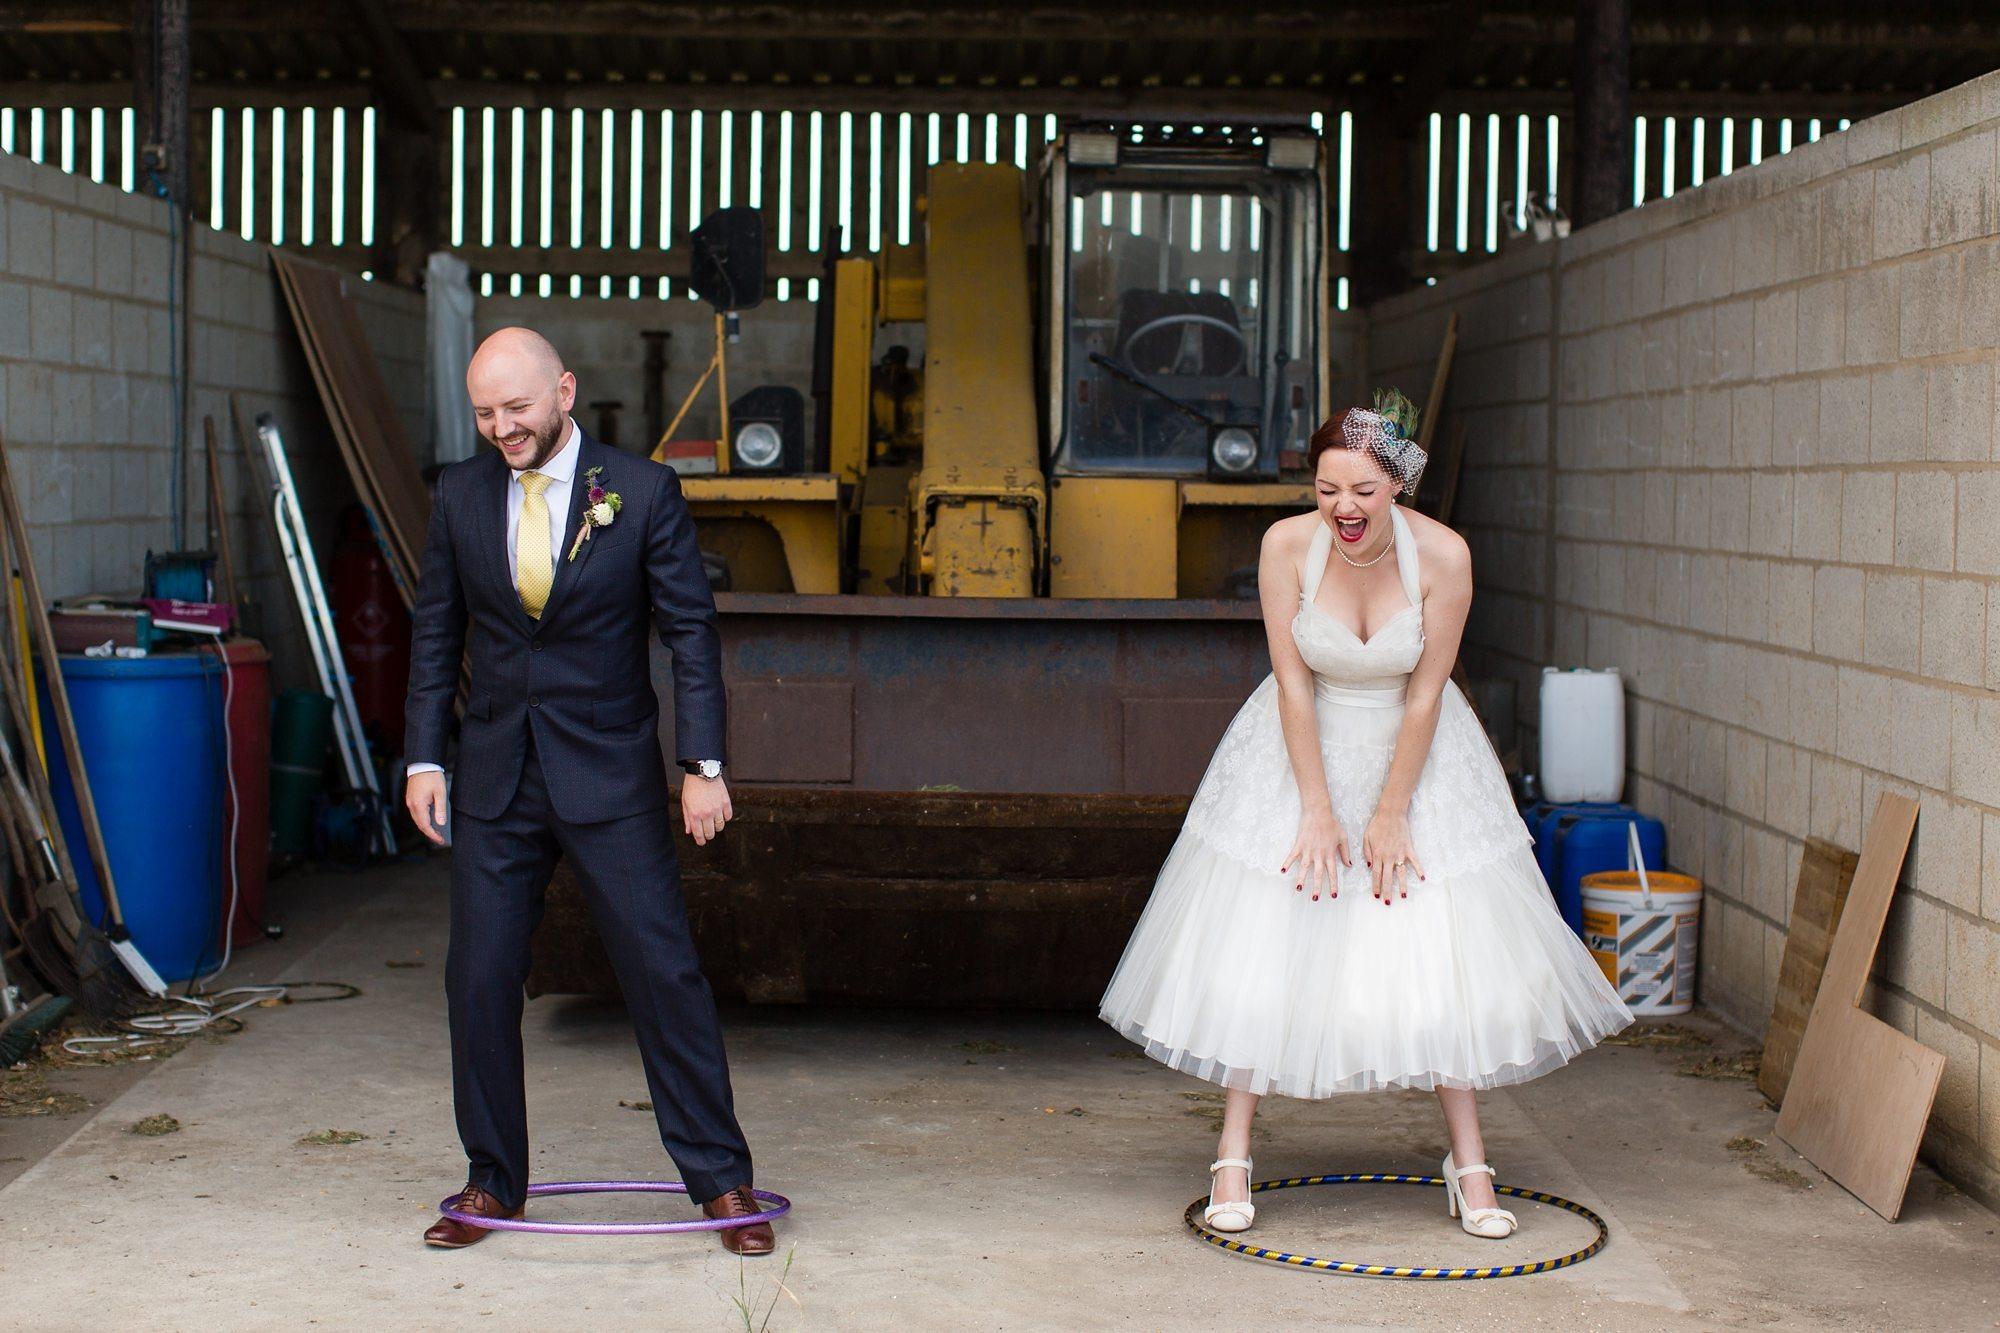 Barn Wedding tips Laughing At Hula Hoop Failure Bride & Groom